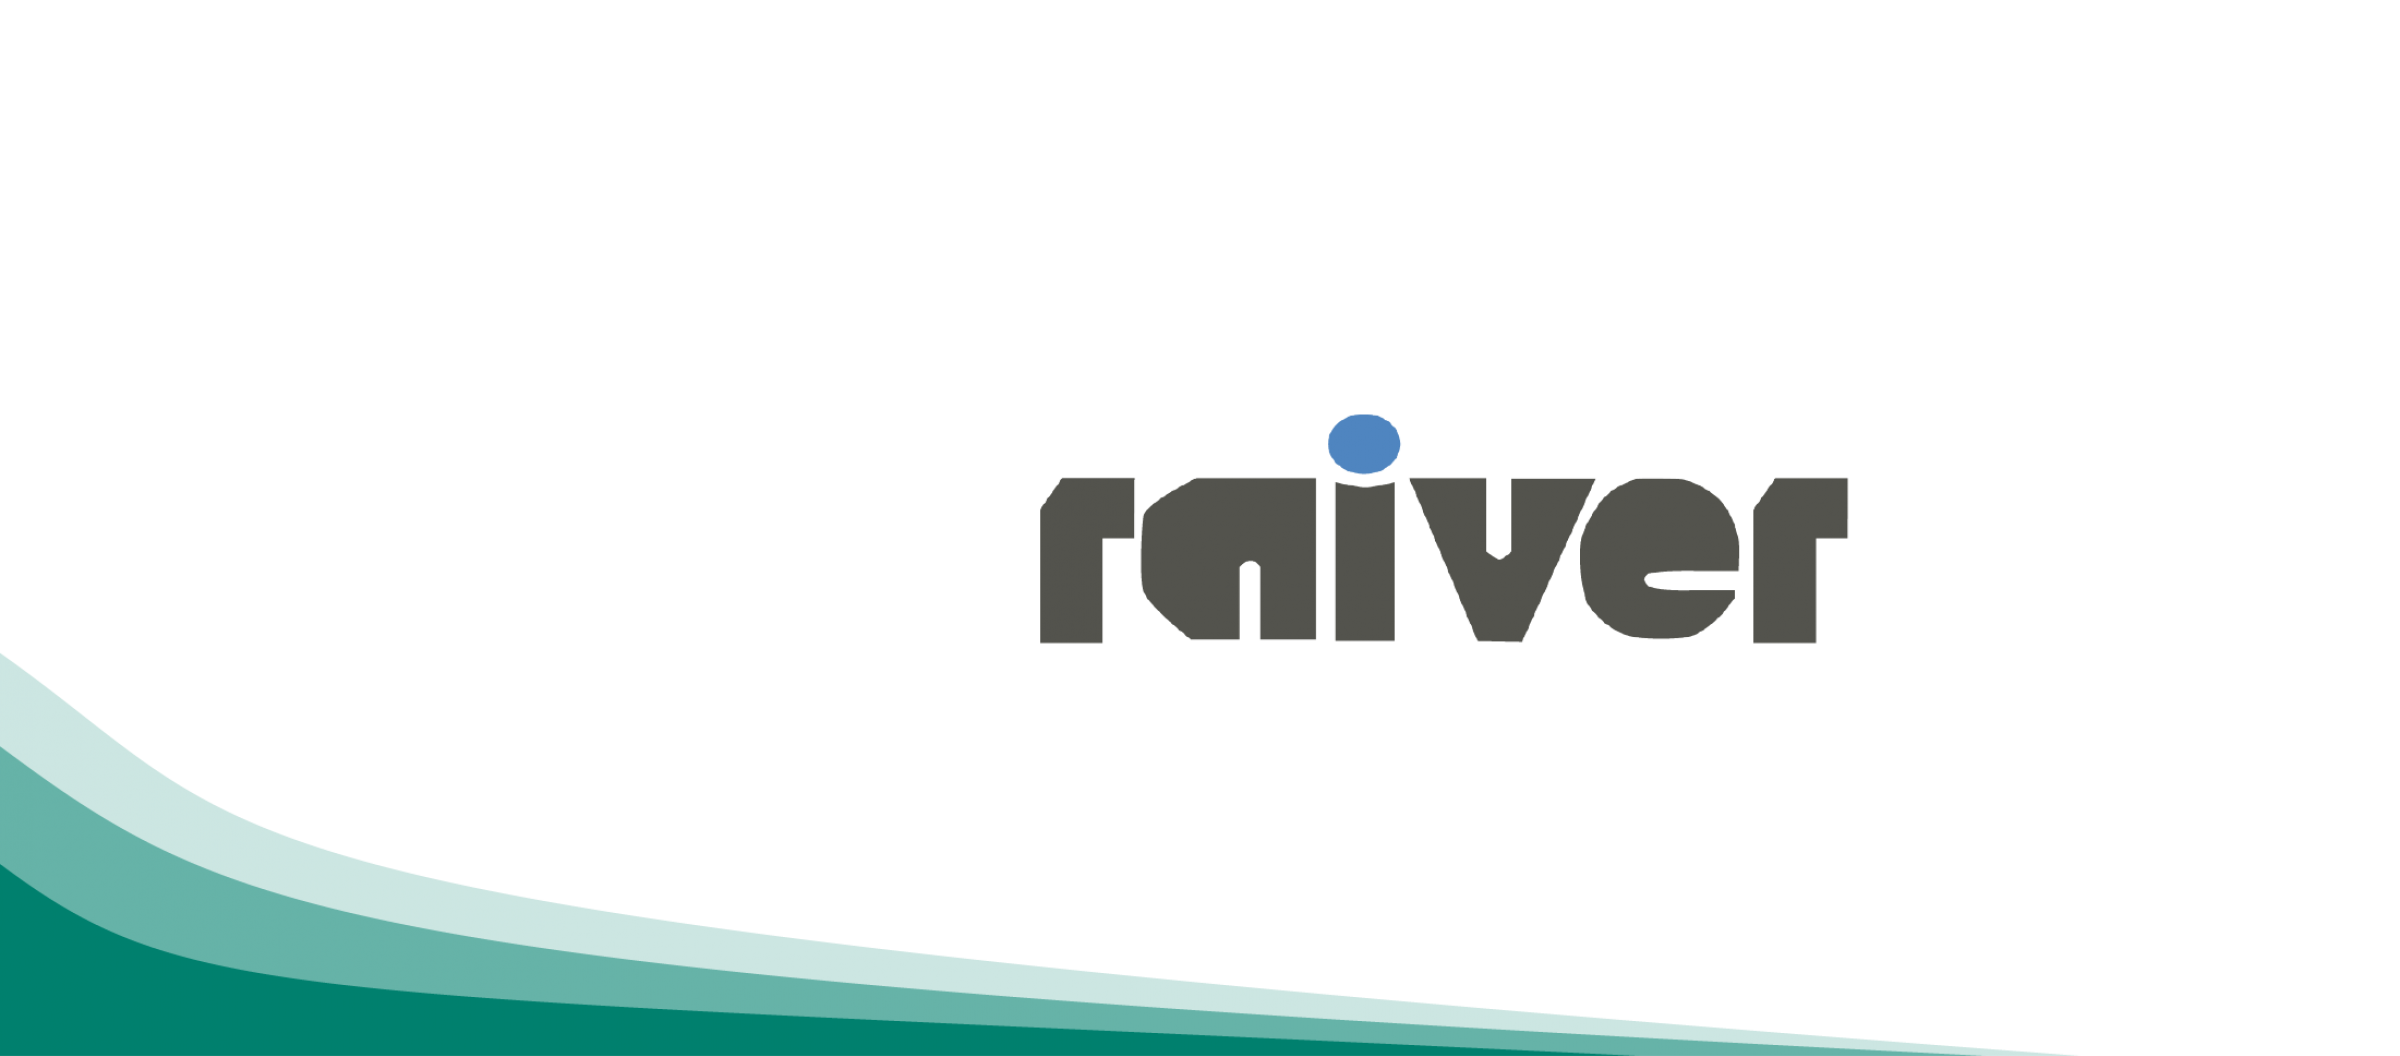 Eptacoat Raiver